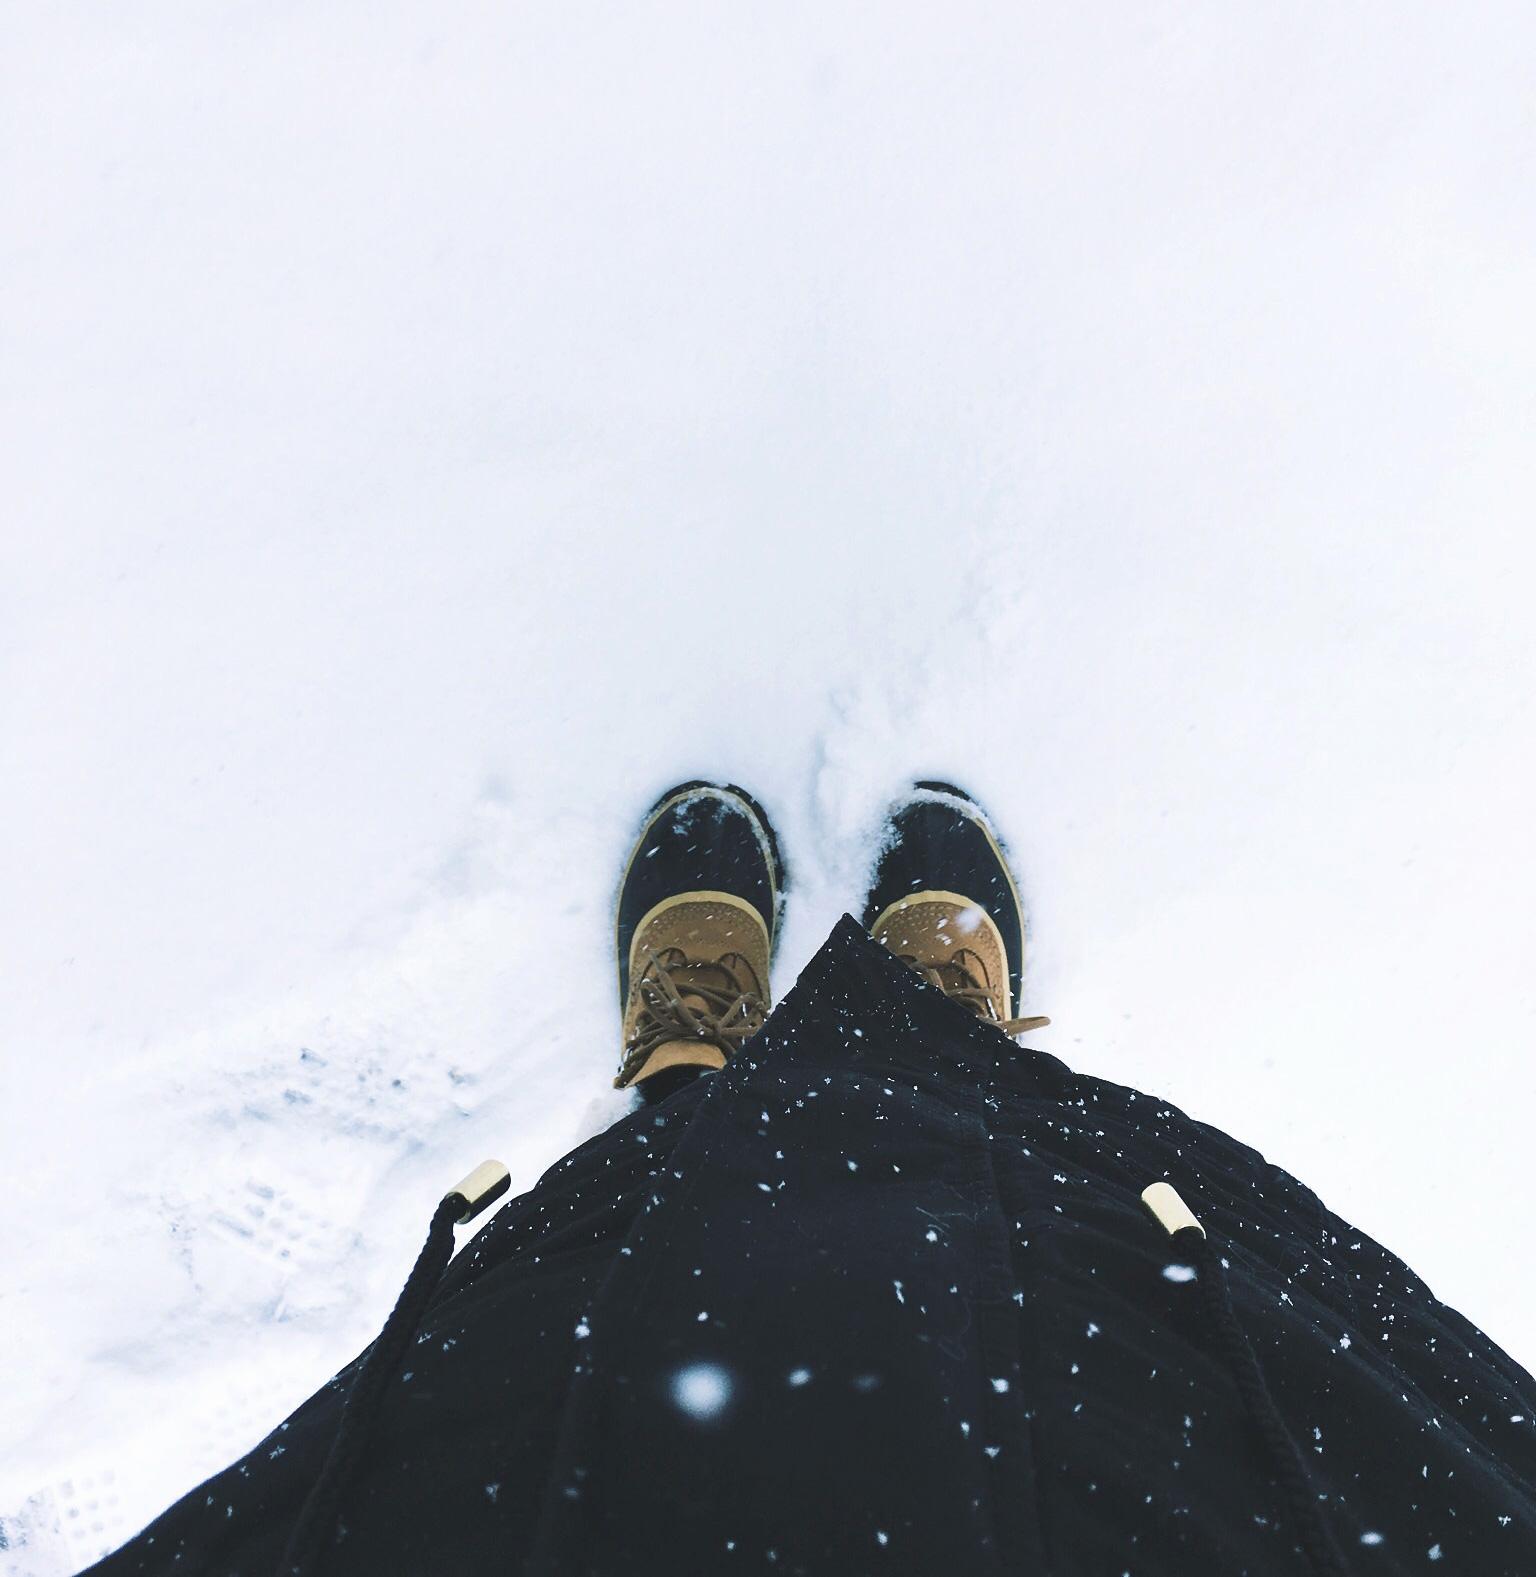 http://sayyes.com/wp-content/uploads/2016/02/snow.jpg